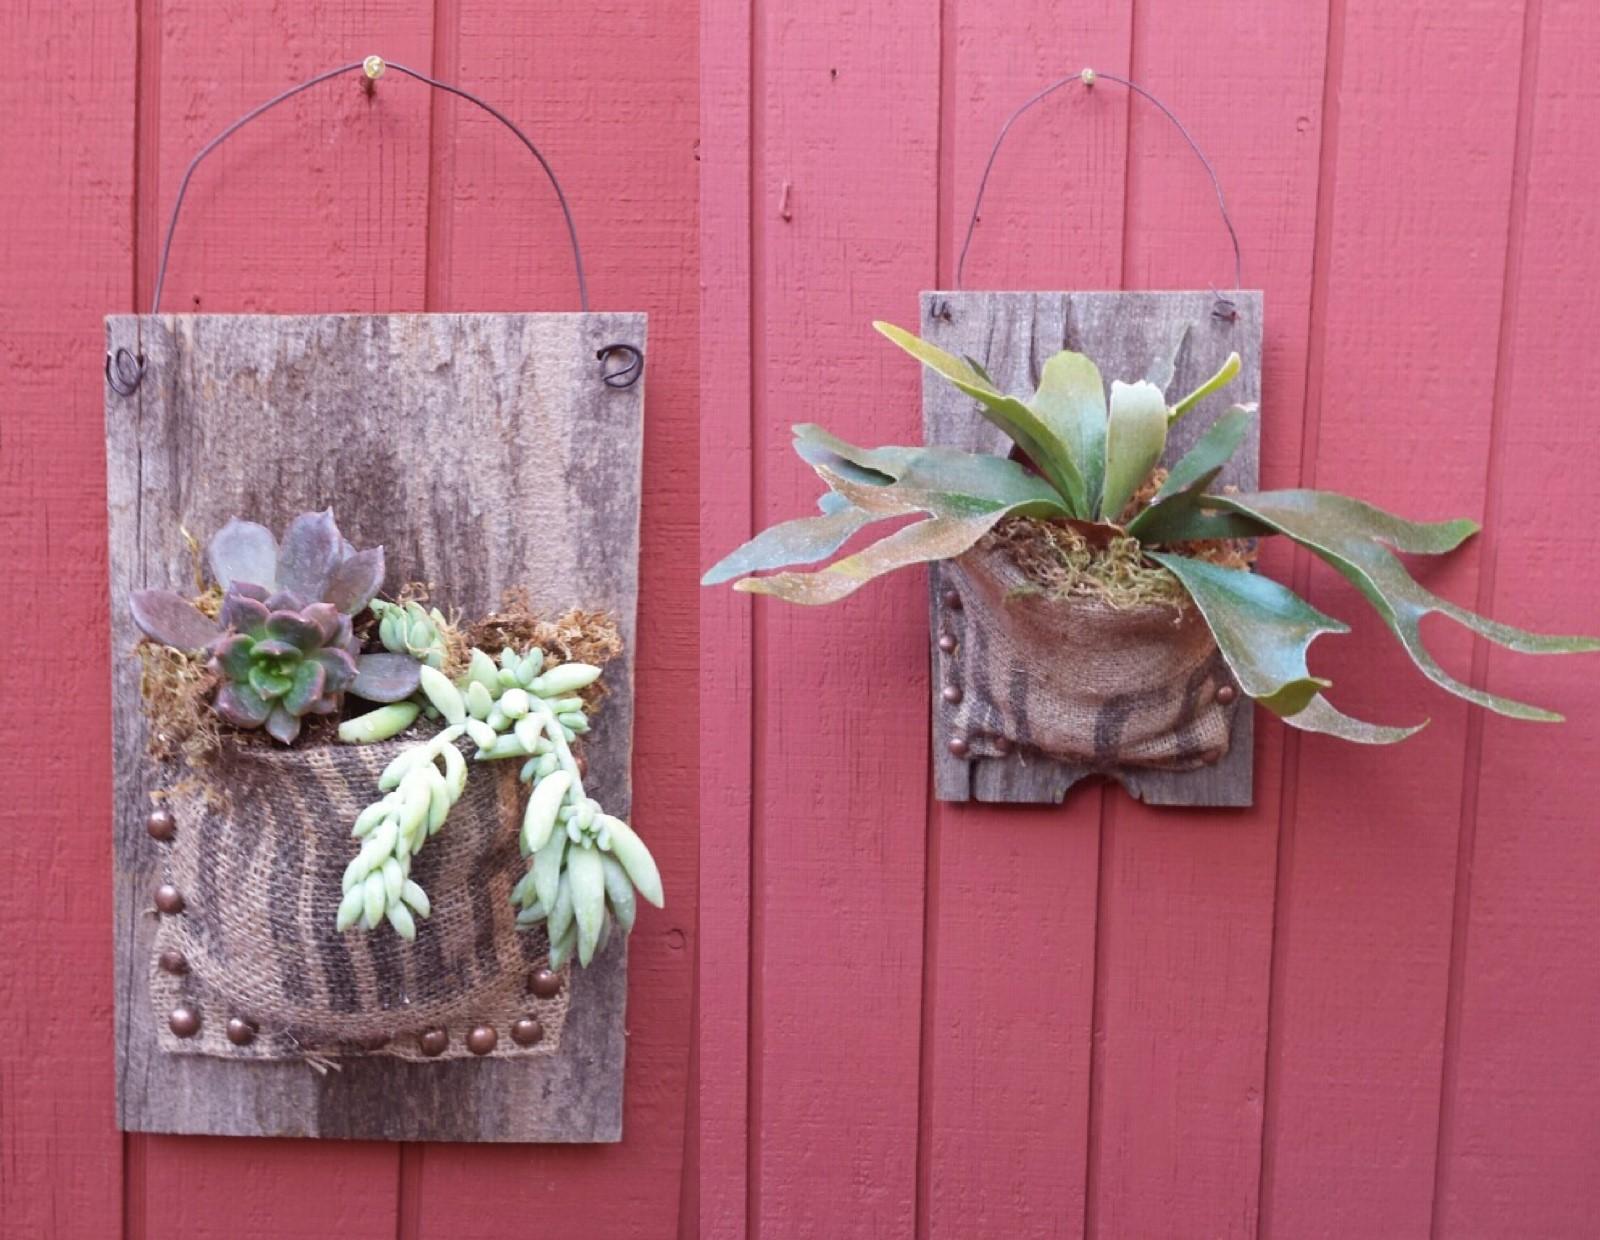 Fern and Succulent workshop